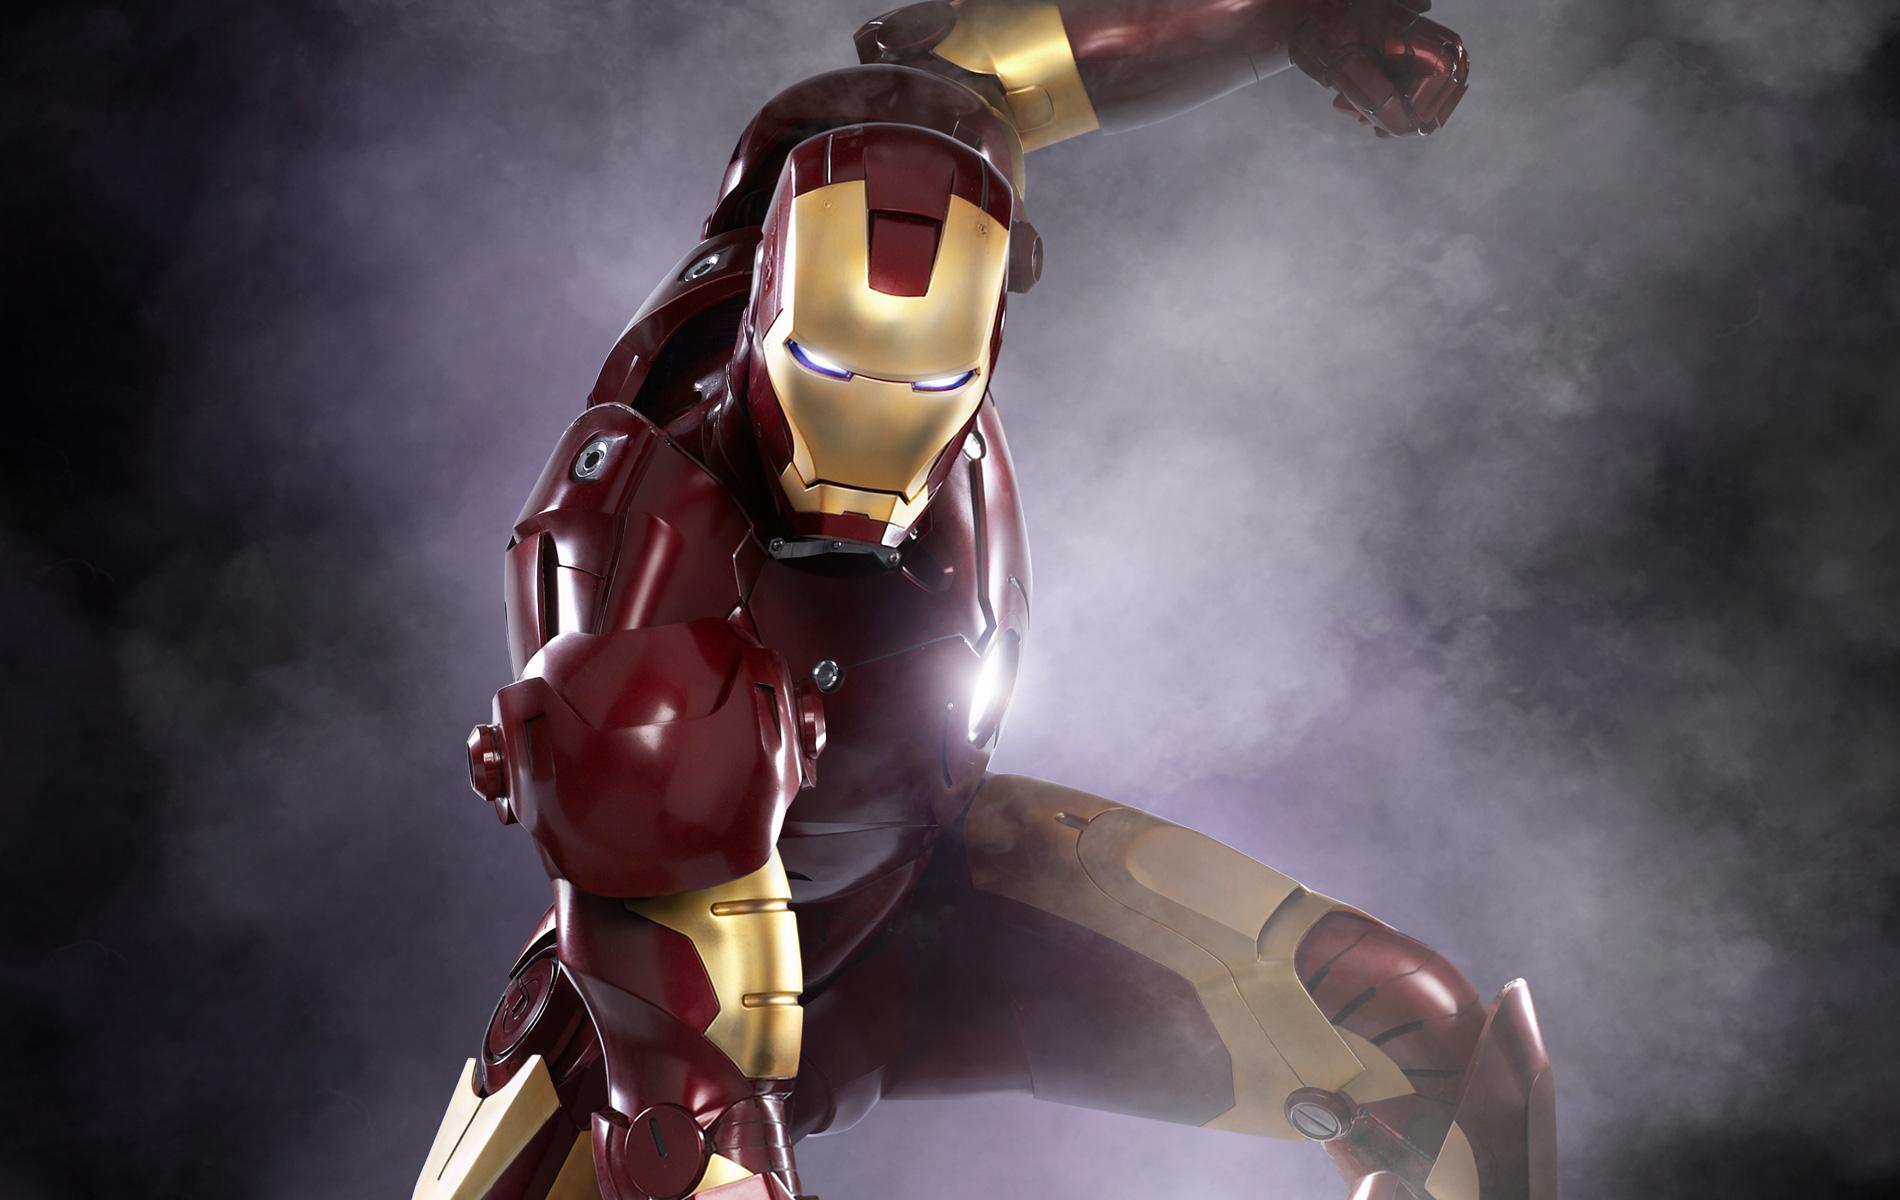 ironman20081486.jpg